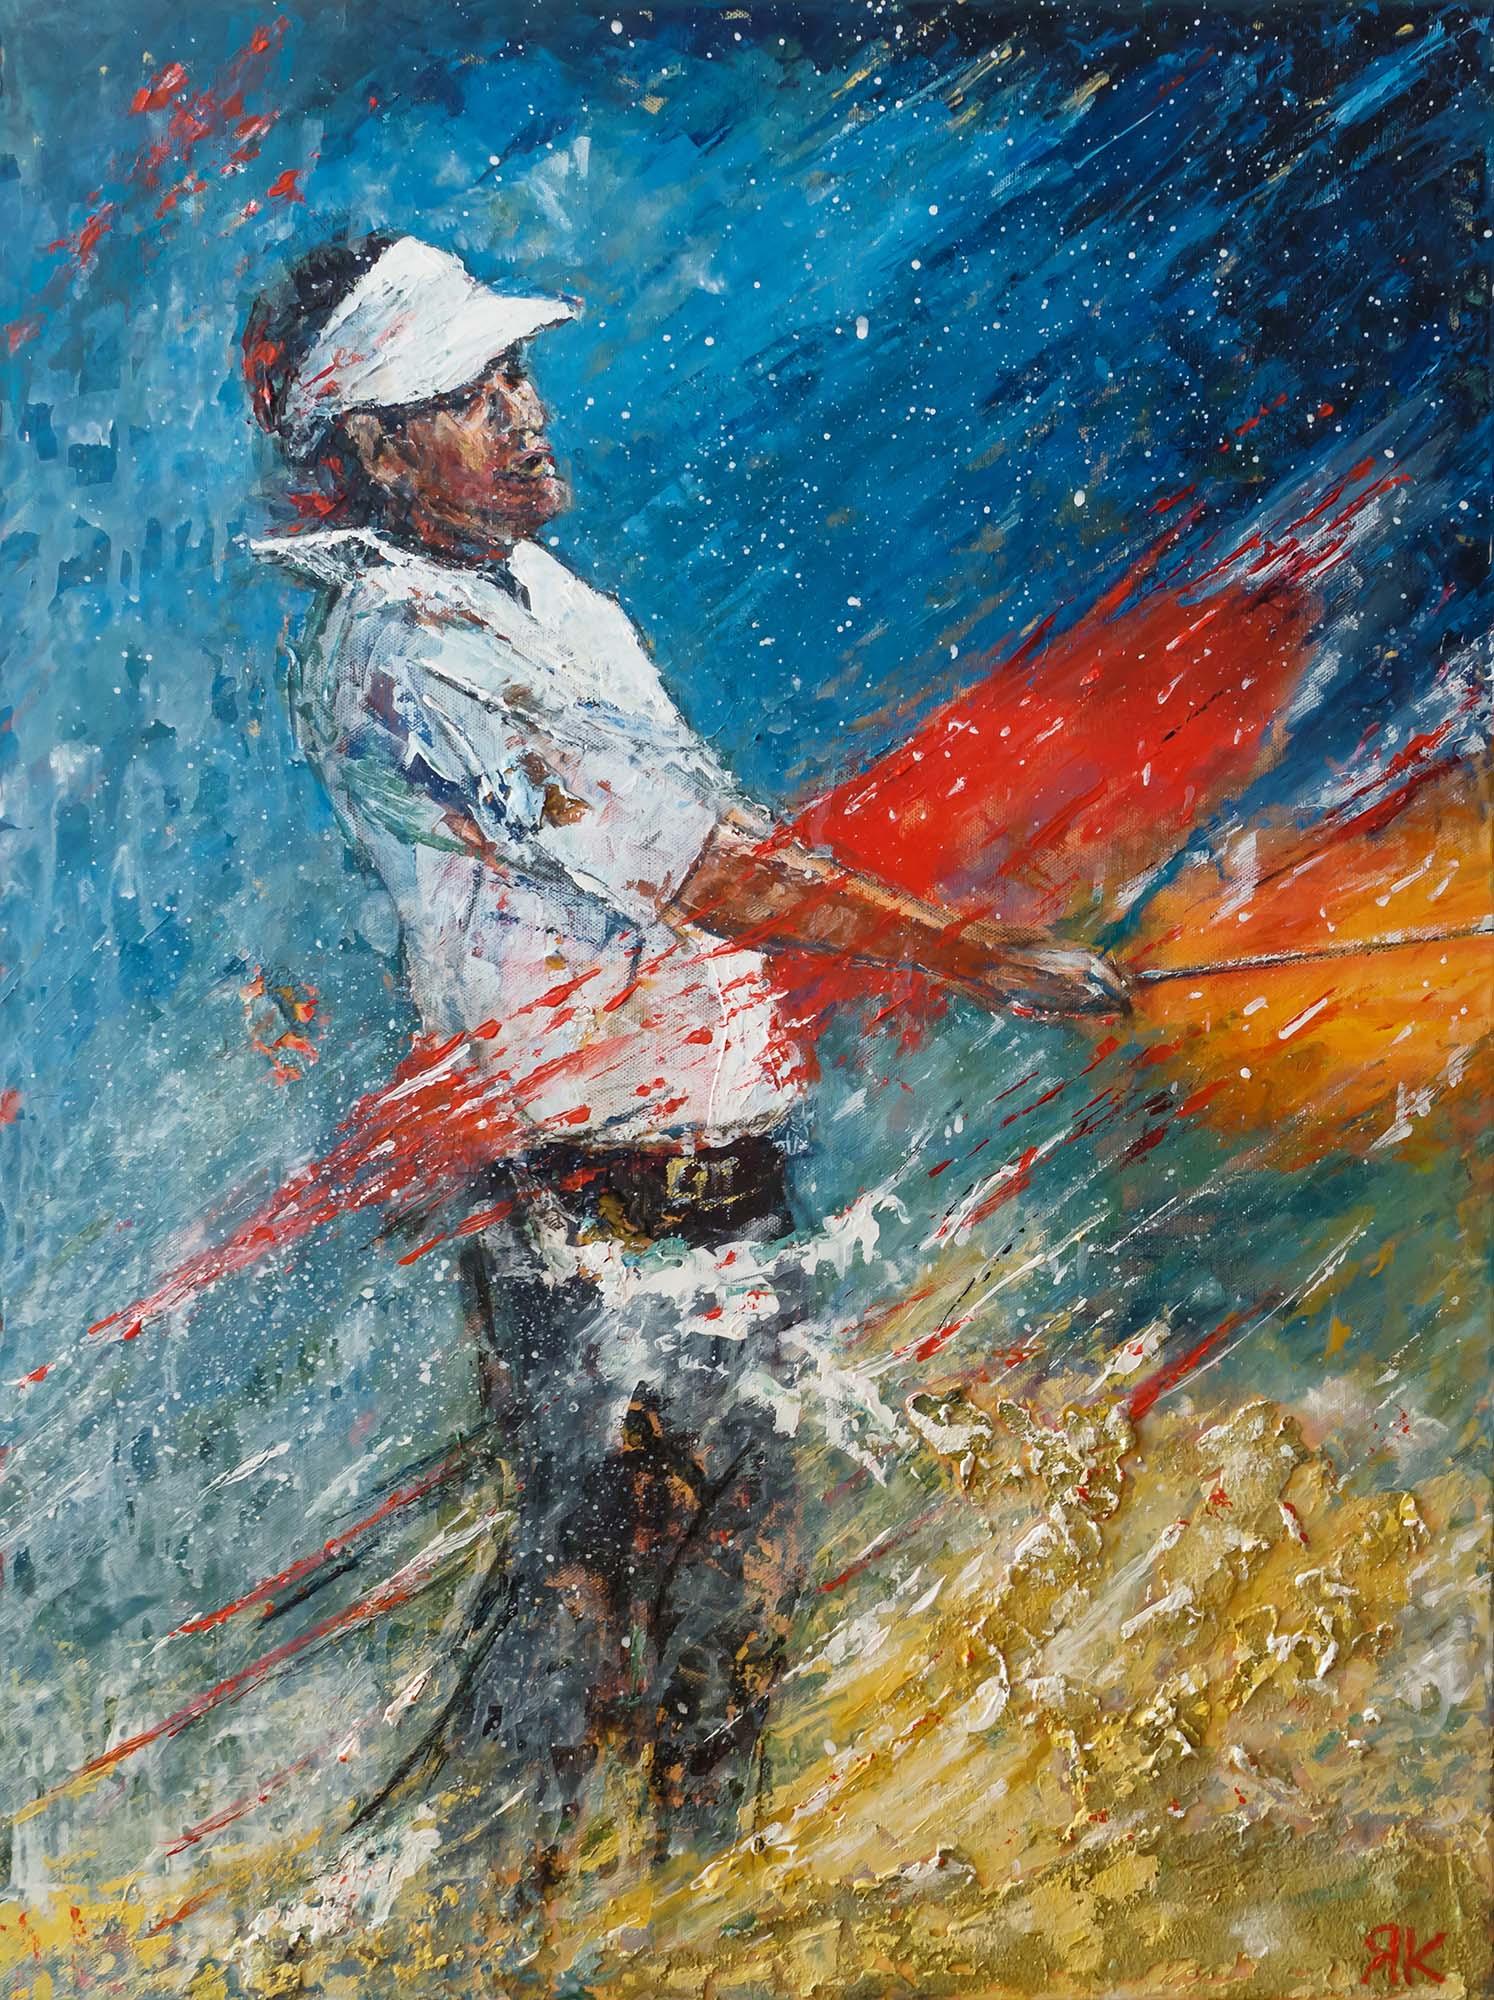 Golf player on colorful field by Ria Kieboom